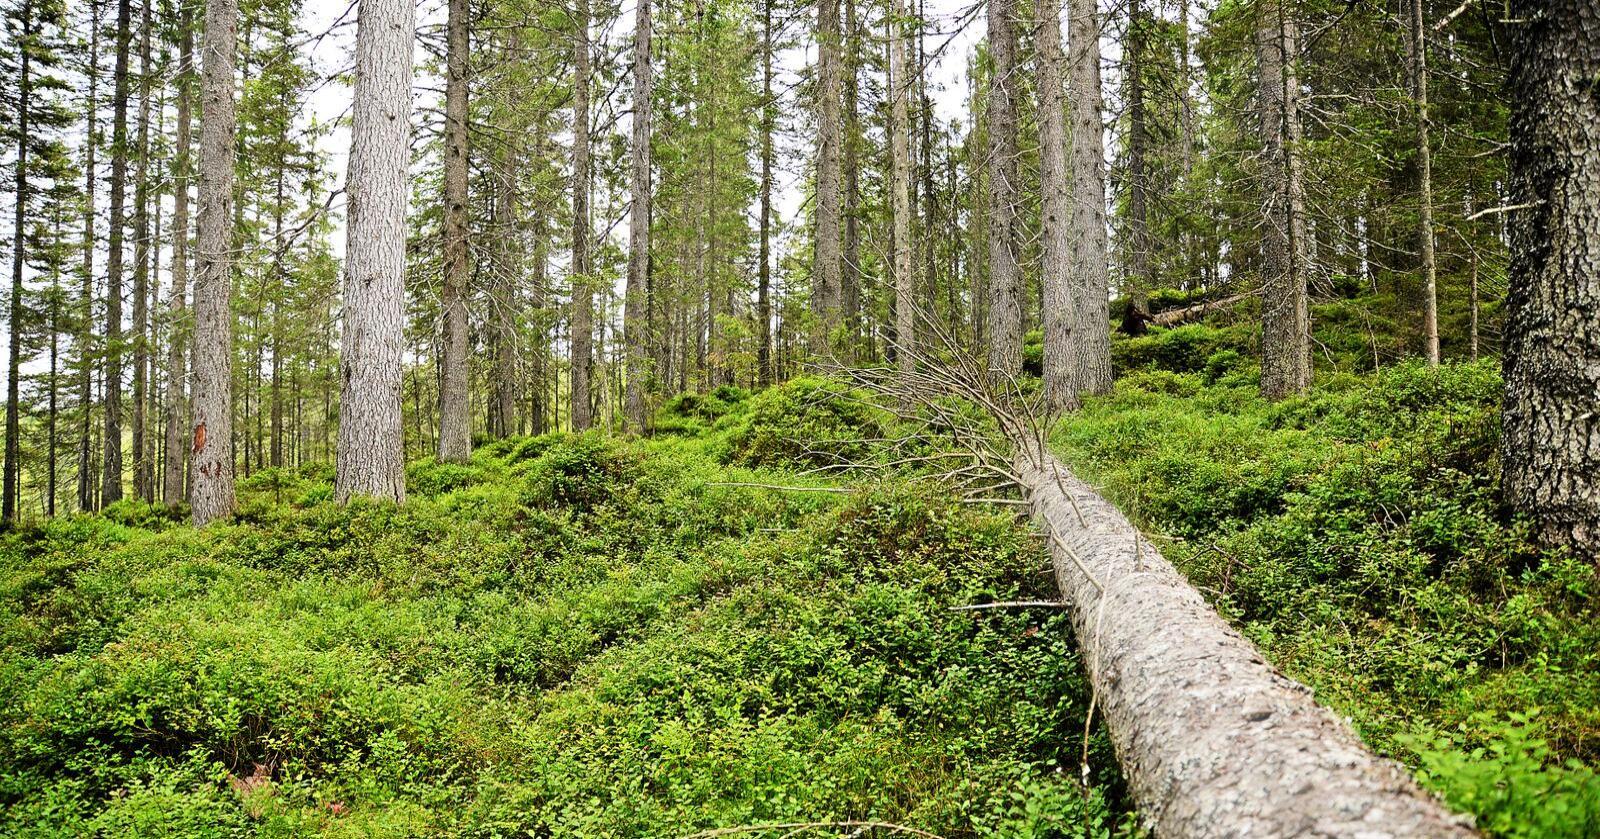 Skog i Follsjå-området i Notodden i Telemark har blitt foreslått vernet. Illustrasjonsfoto: Siri Juell Rasmussen